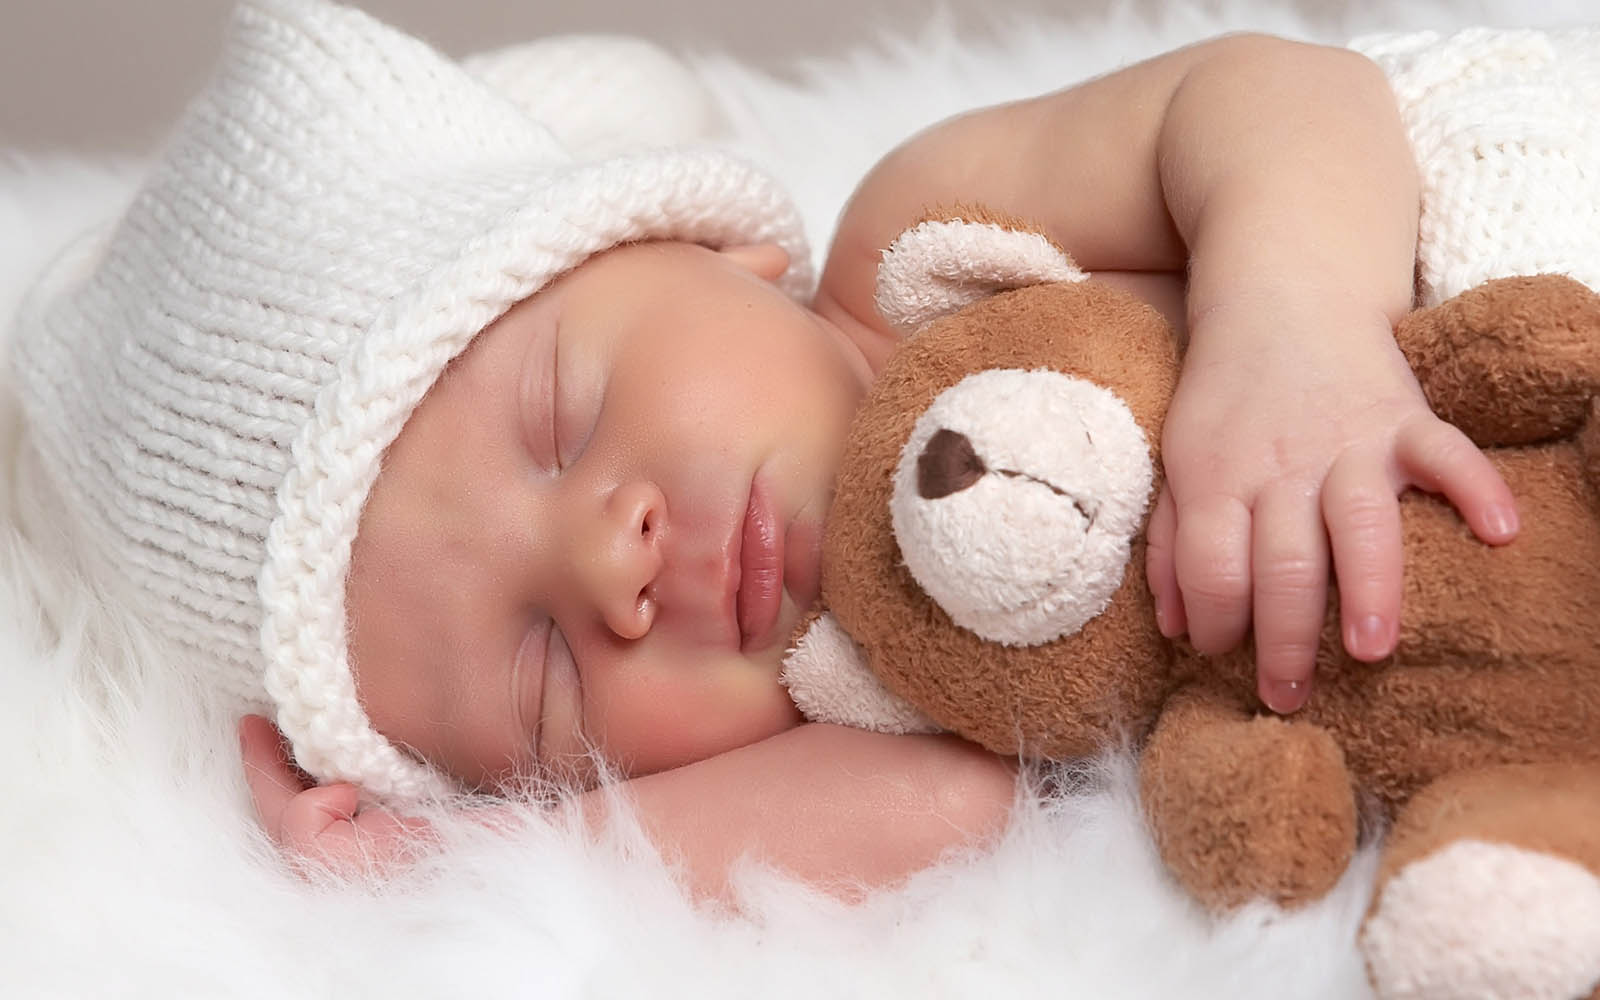 Sleeping Cute Little Baby With Teddy Bear